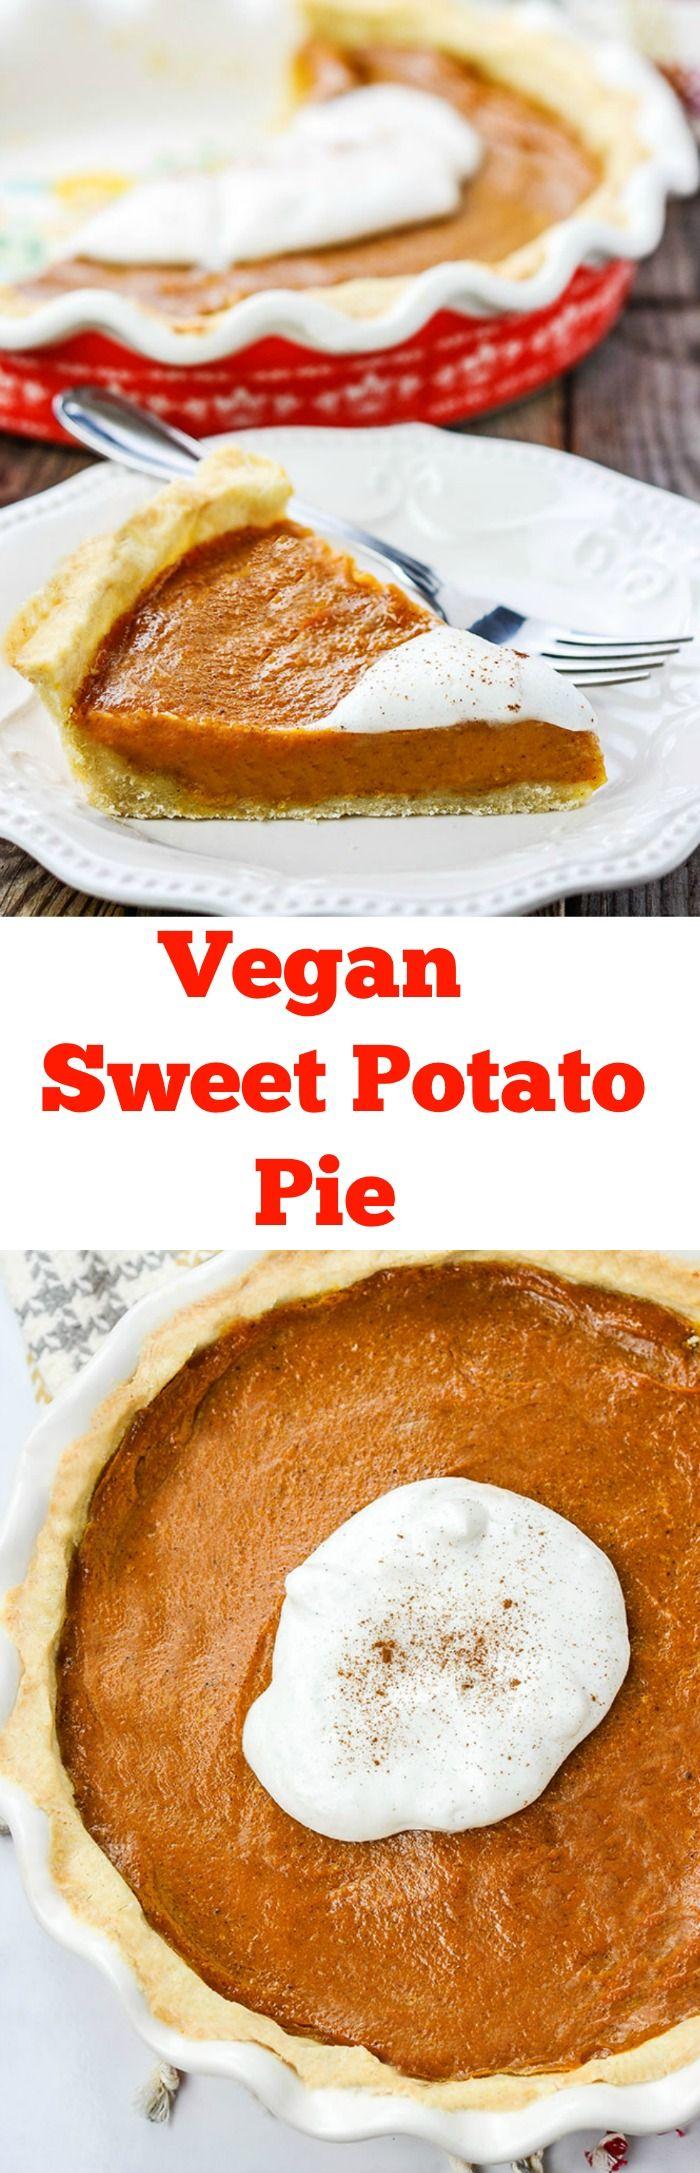 Vegan Sweet Potato Pie  #GlutenFree  #veganrecipes  #thanksgiving #christmas  #SoulFood